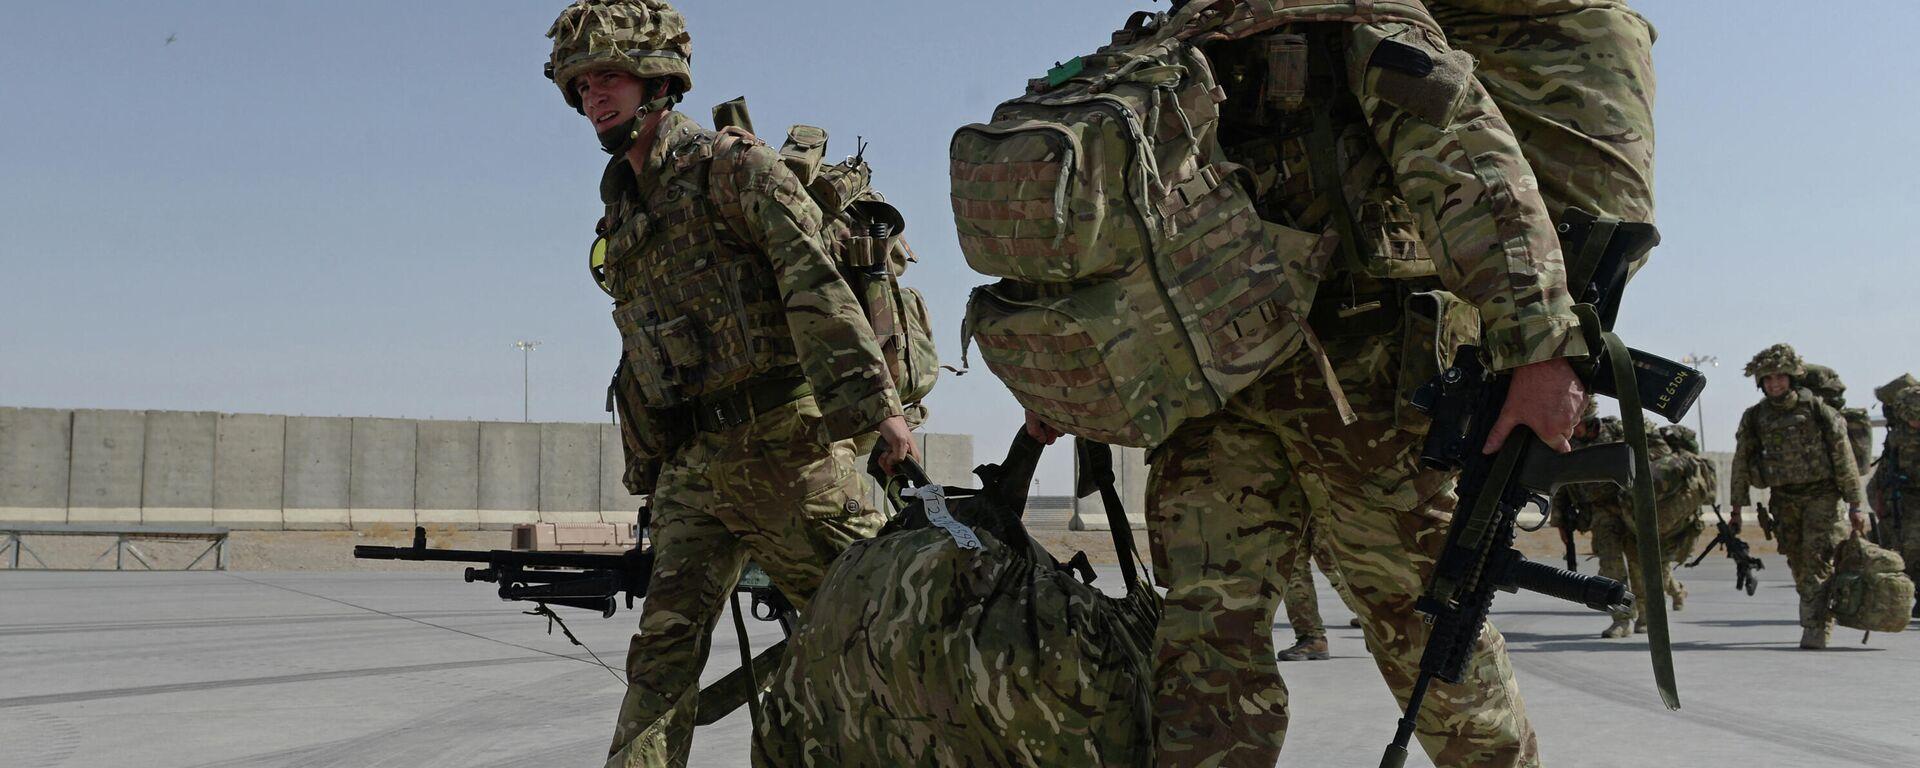 Britische Soldaten in Afghanistan (Symbolbild) - SNA, 1920, 14.04.2021